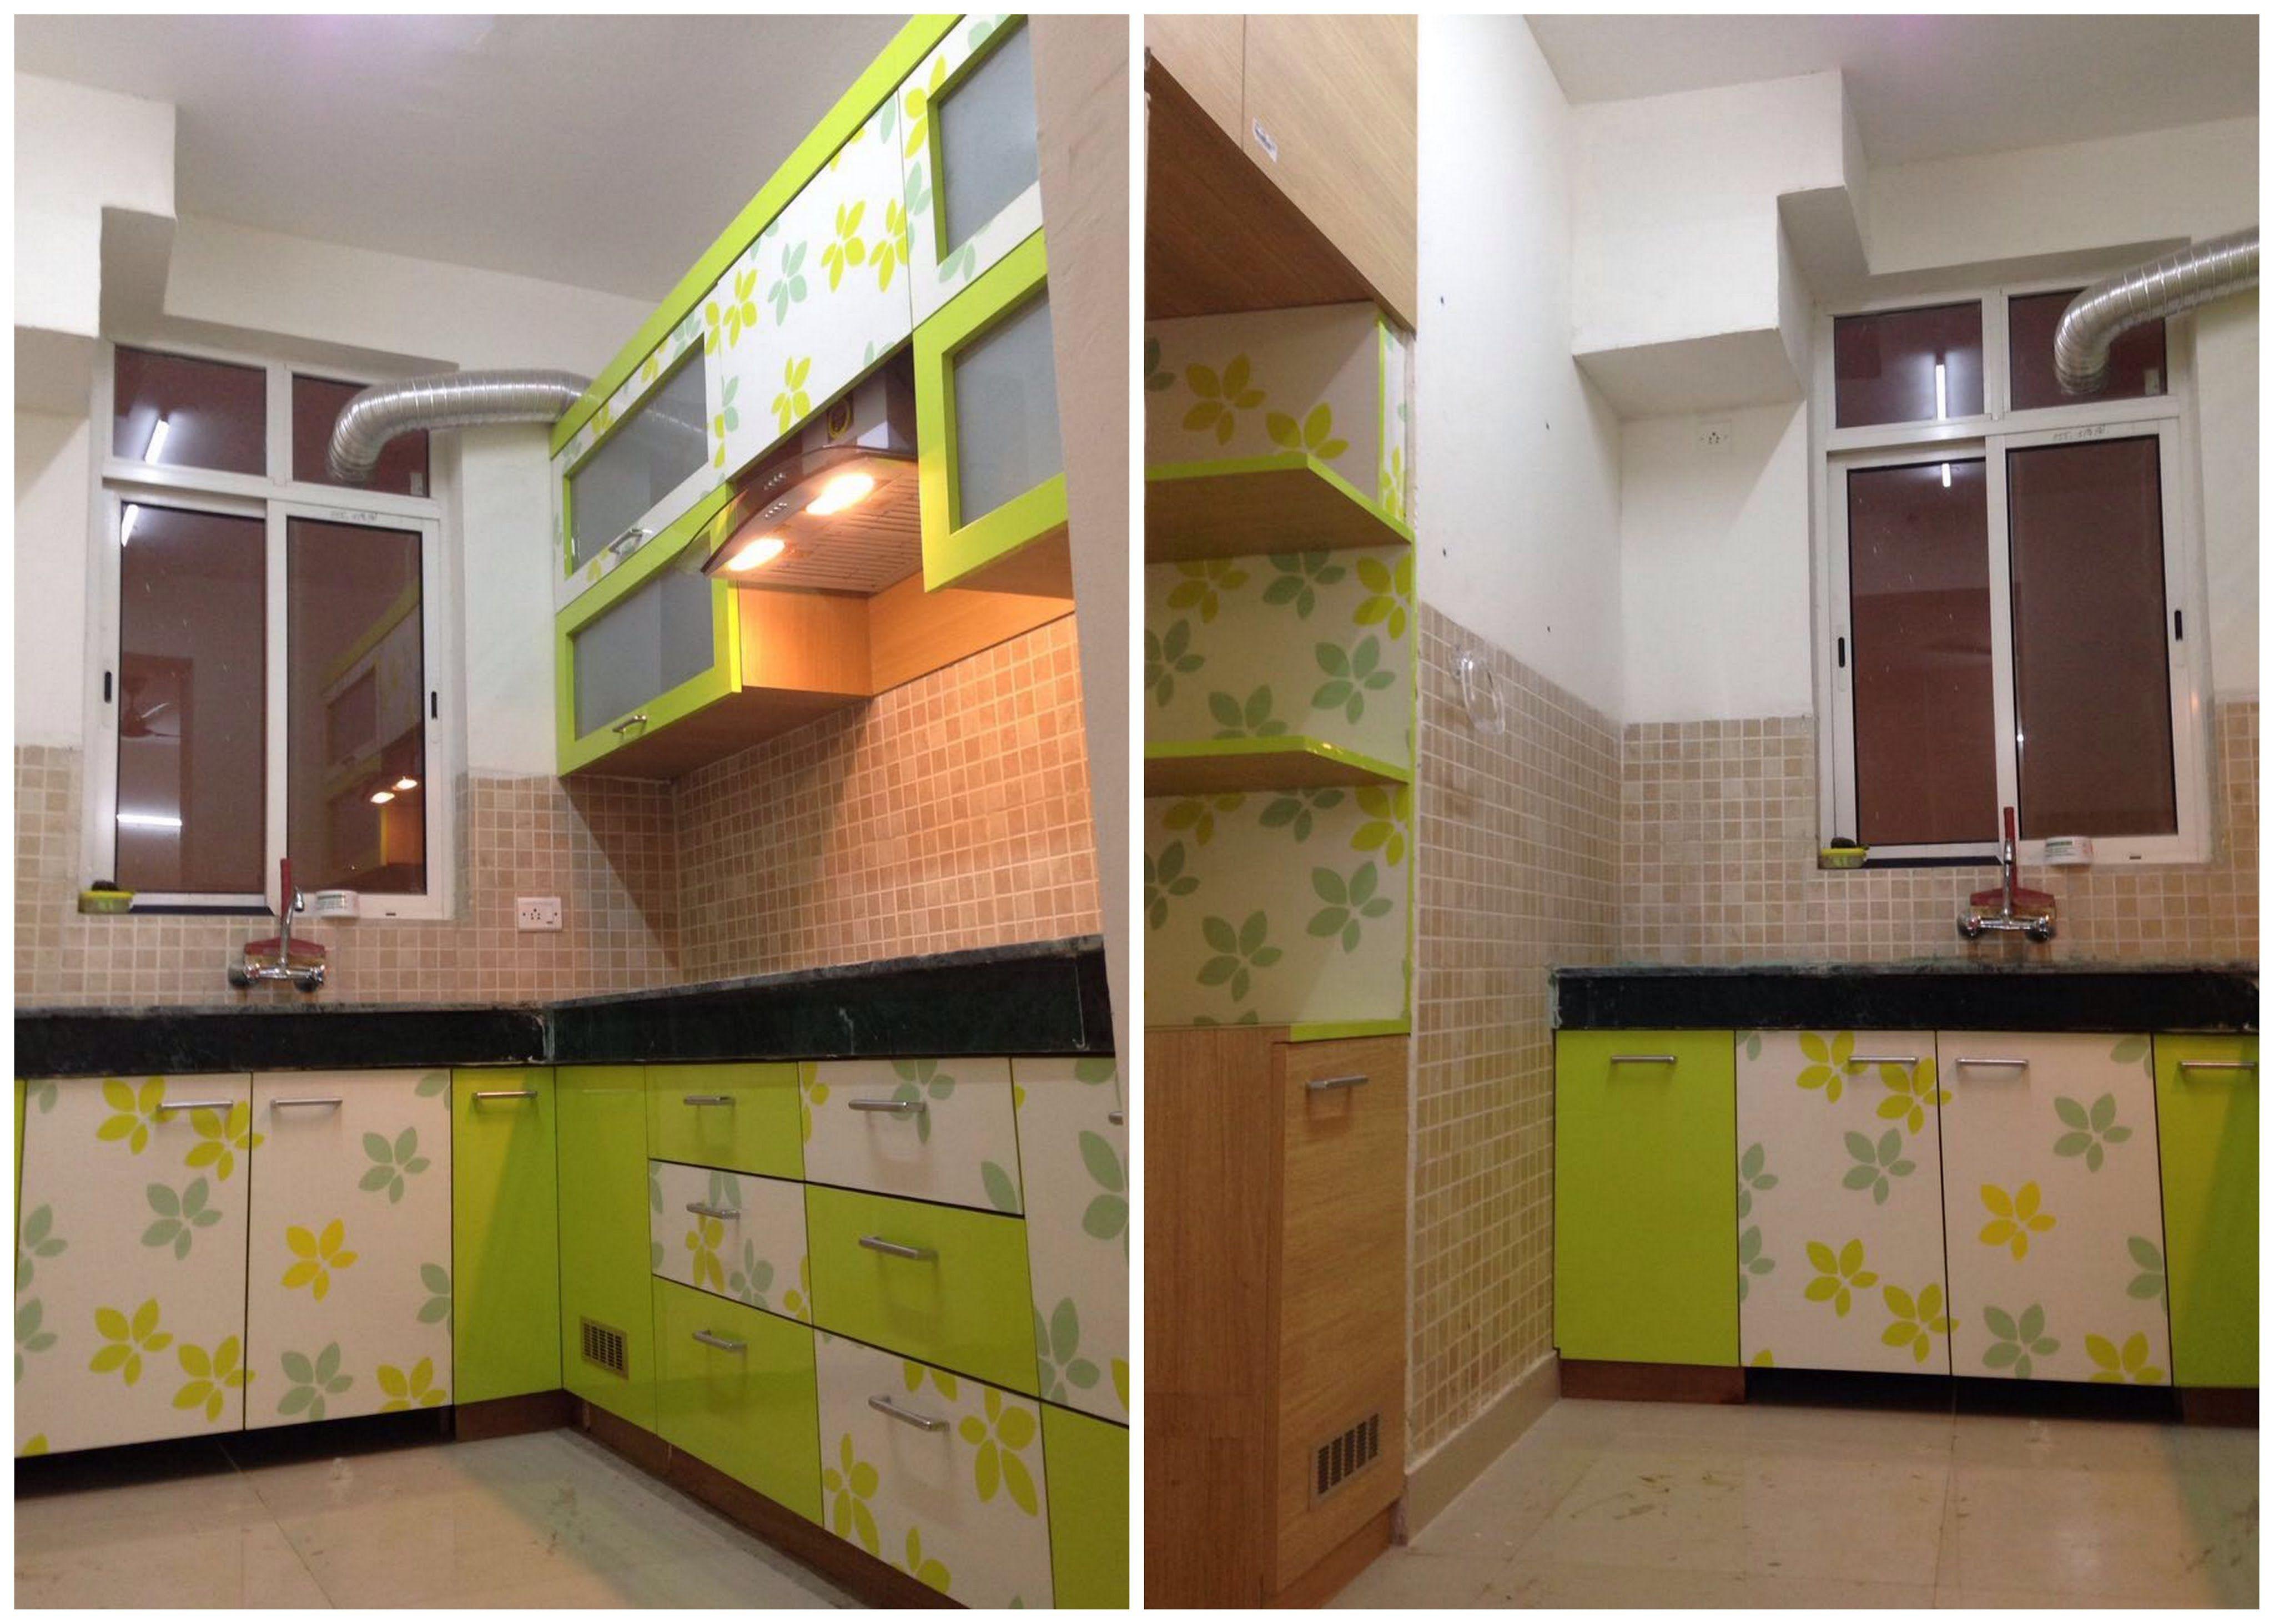 The Adorning Concepts Semi Open Kitchen Concepts India Development ...